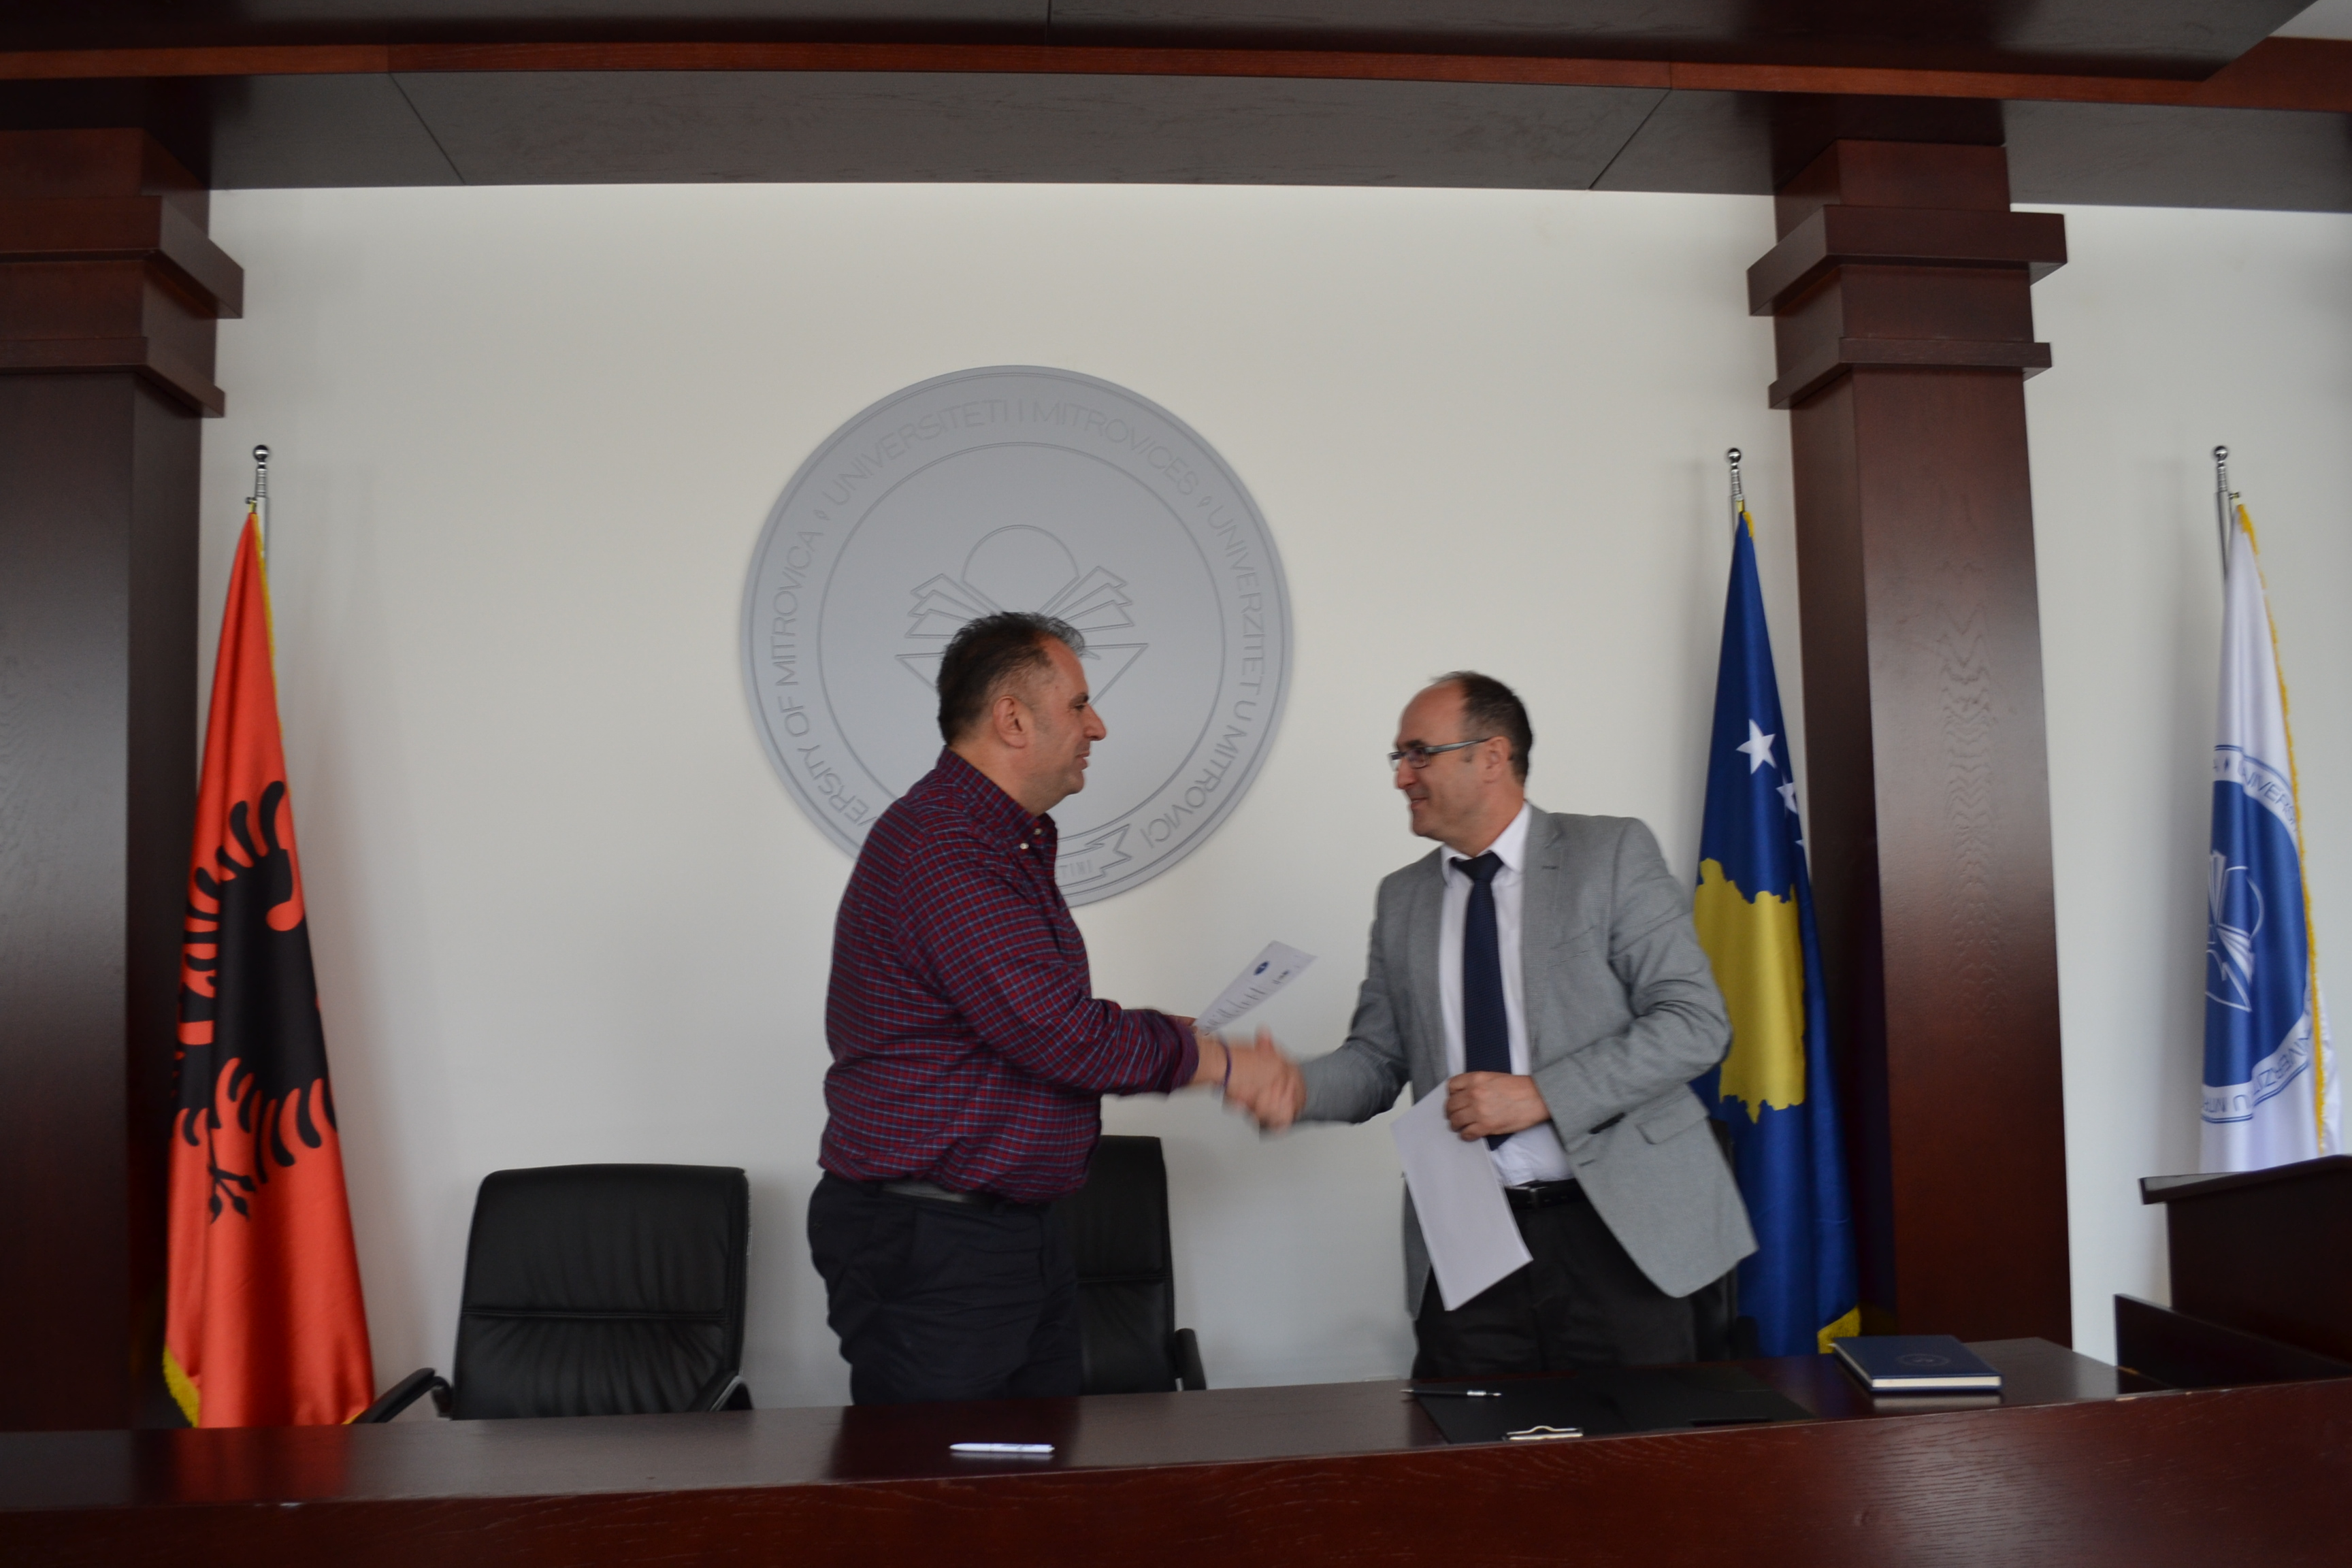 Prorektori Morina Dhe Kryetari Gërxhaliu